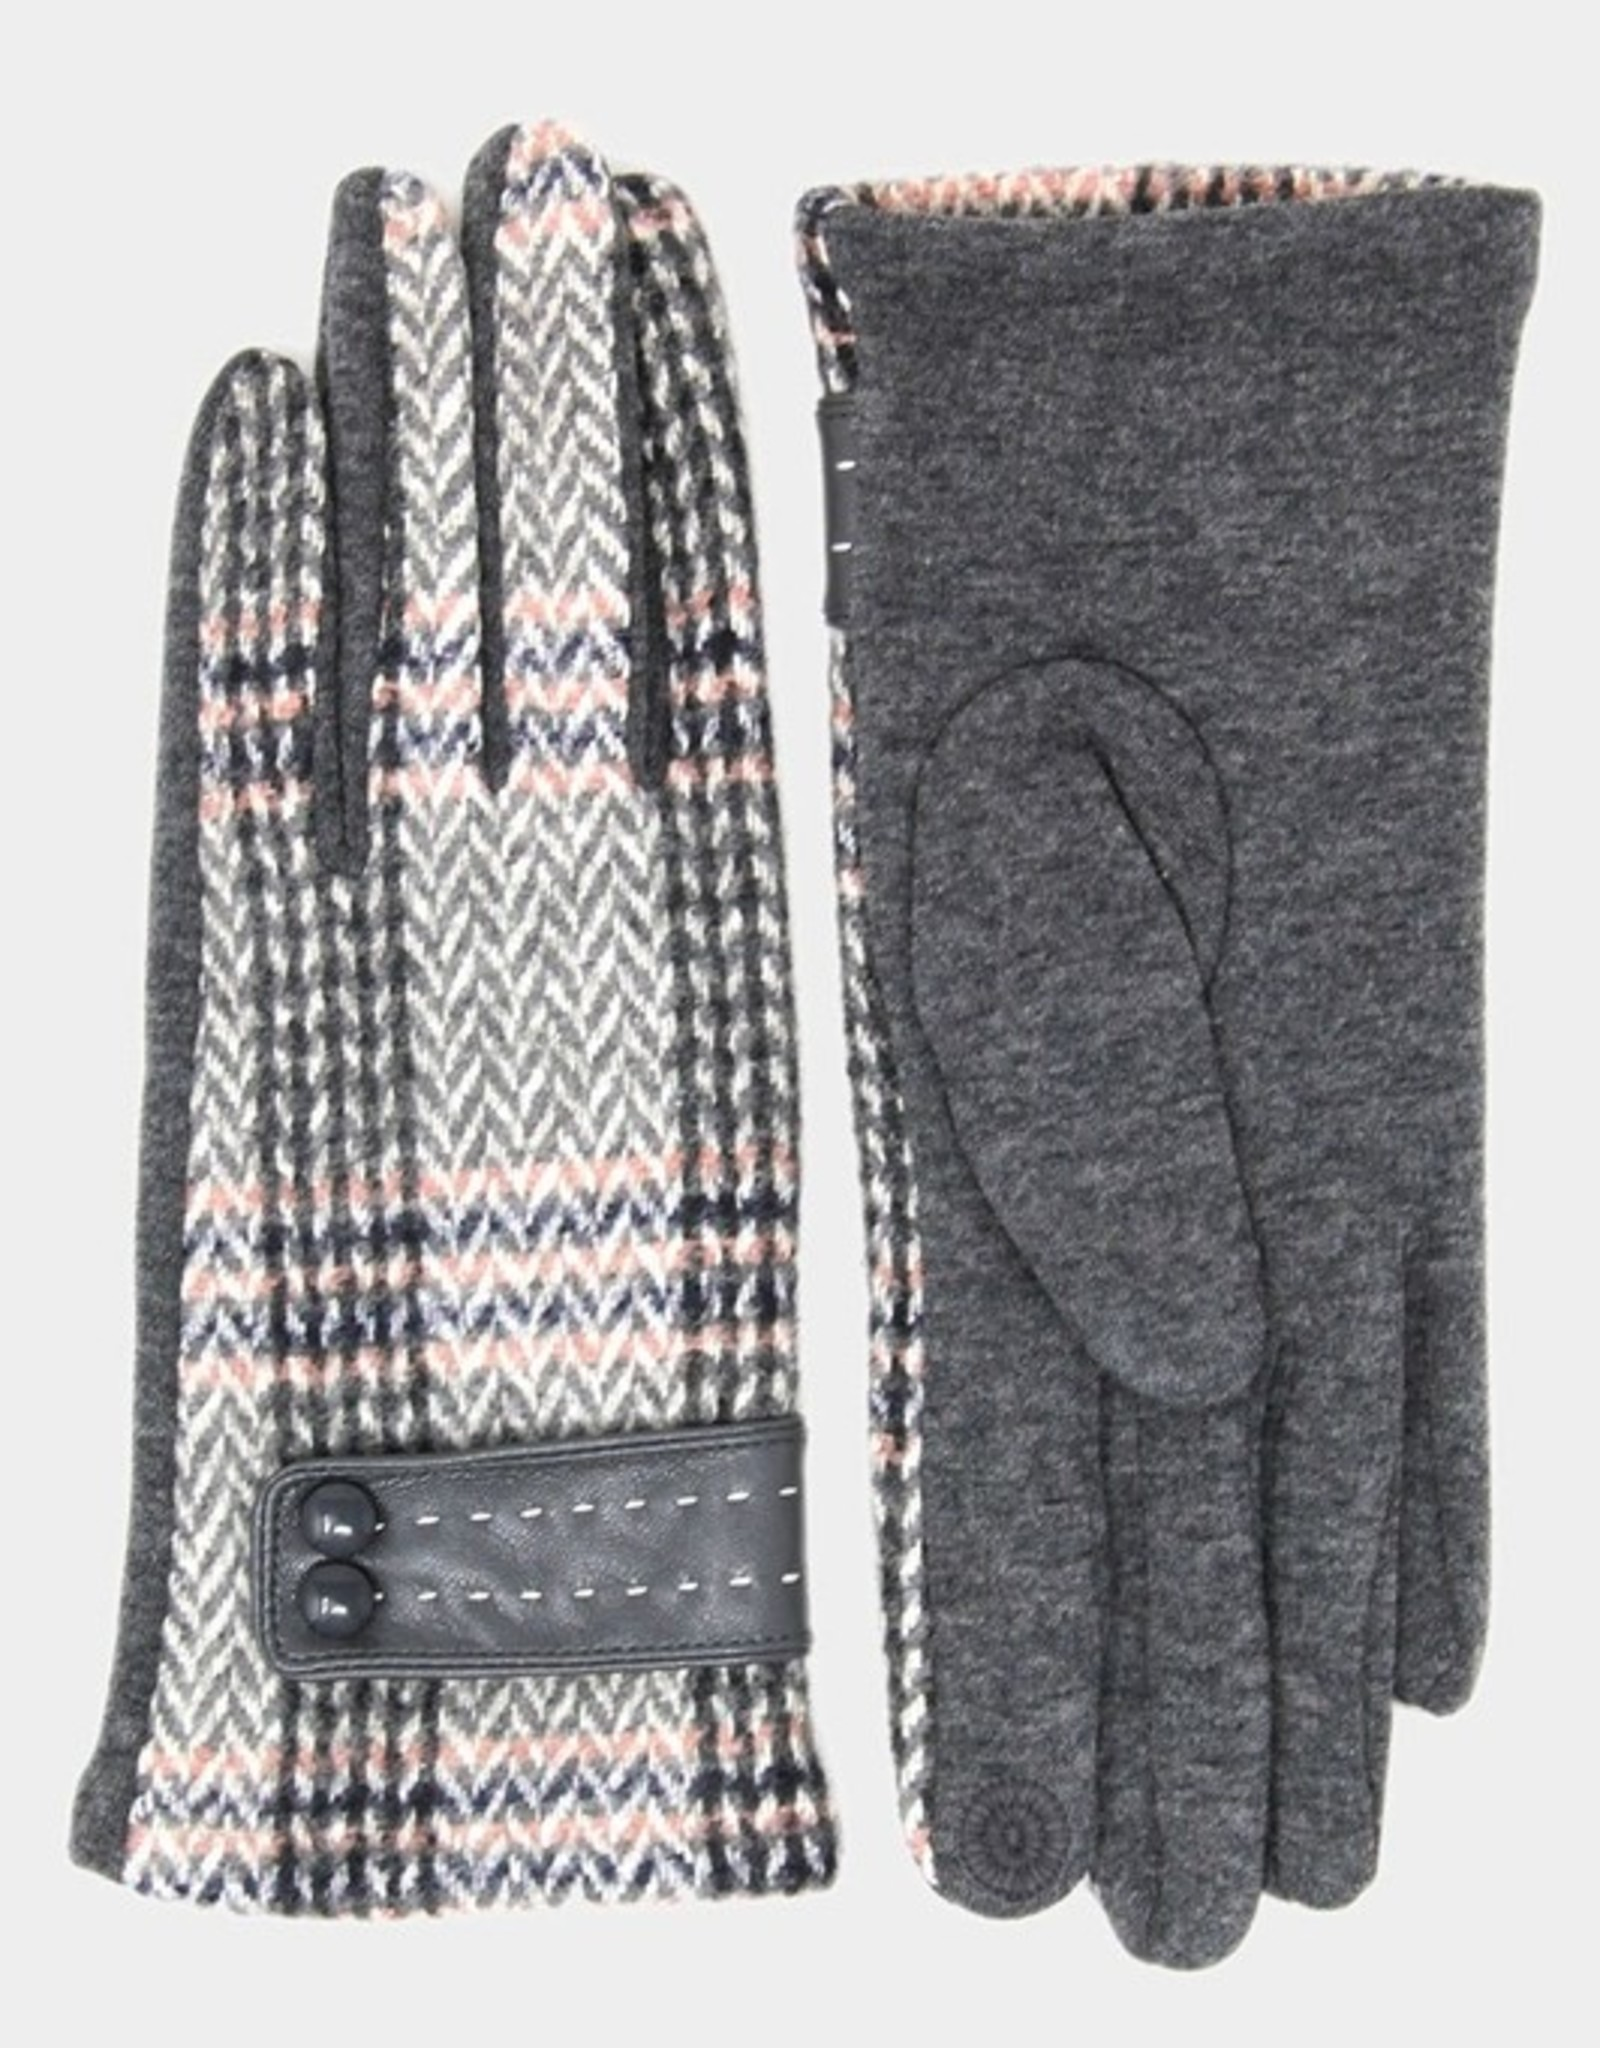 Plaid smart gloves